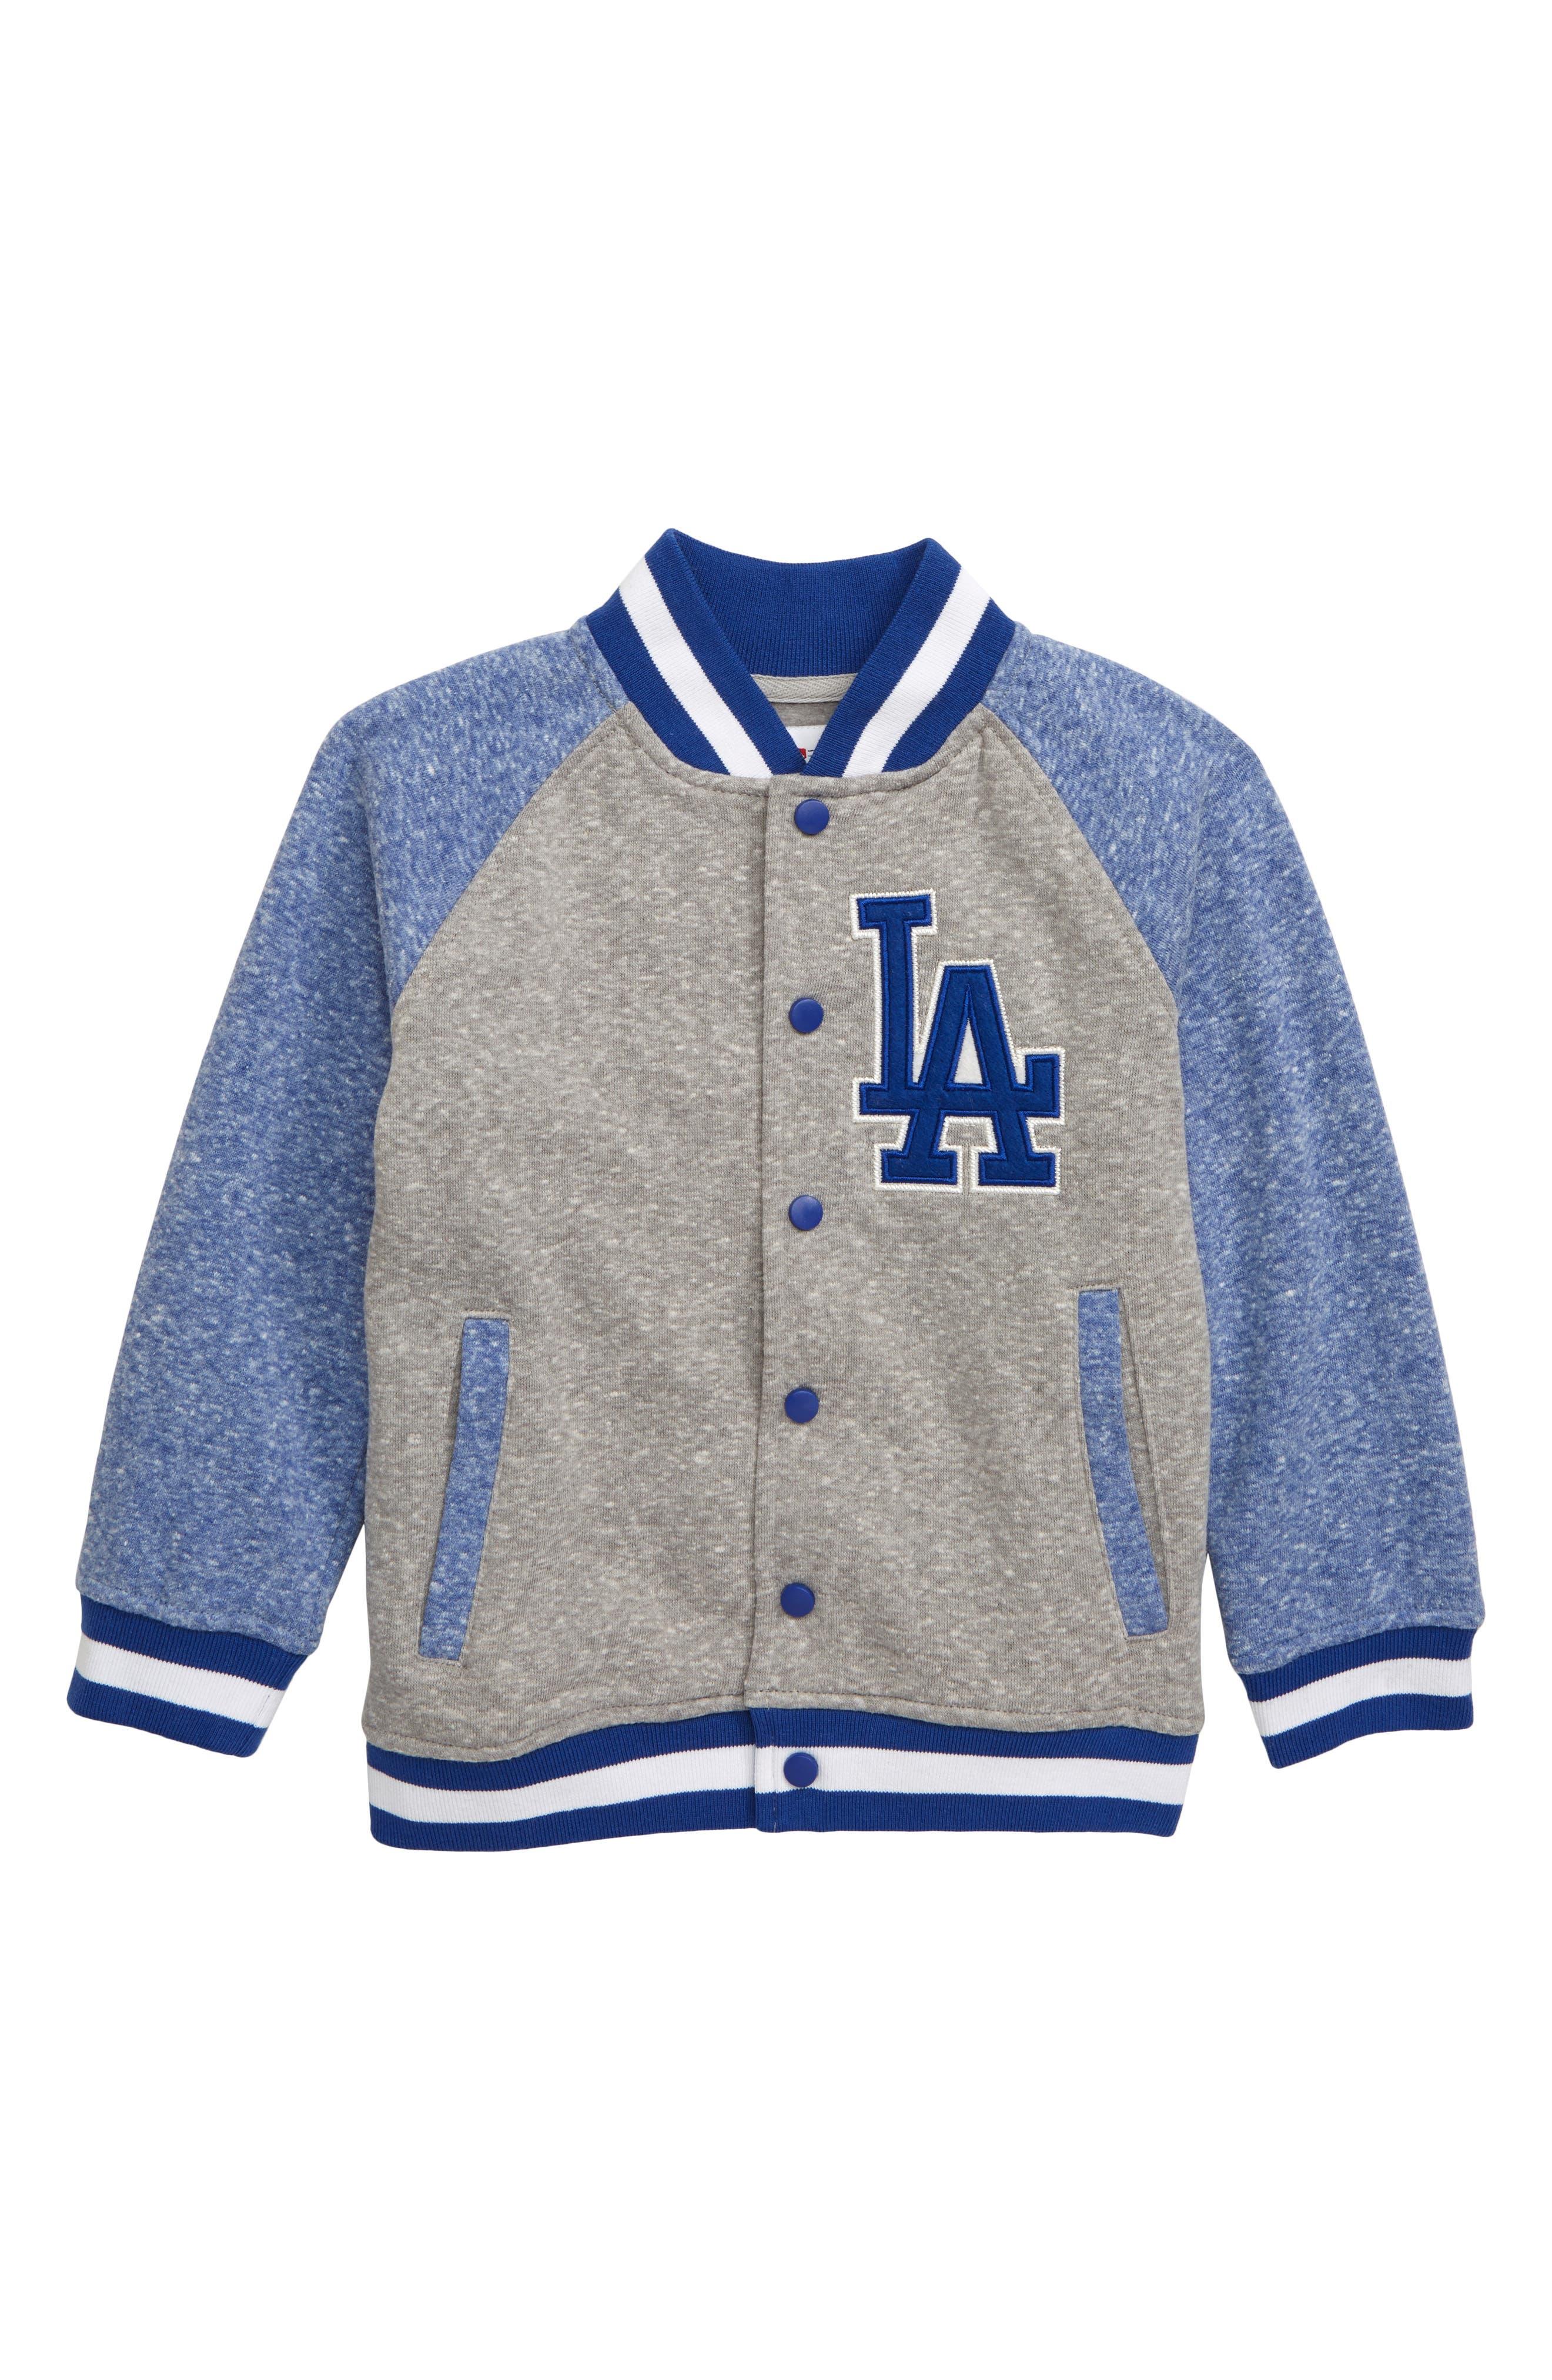 MAJESTIC MLB Los Angeles Dodgers Pride Fleece Bomber Jacket, Main, color, ROYAL BLUE